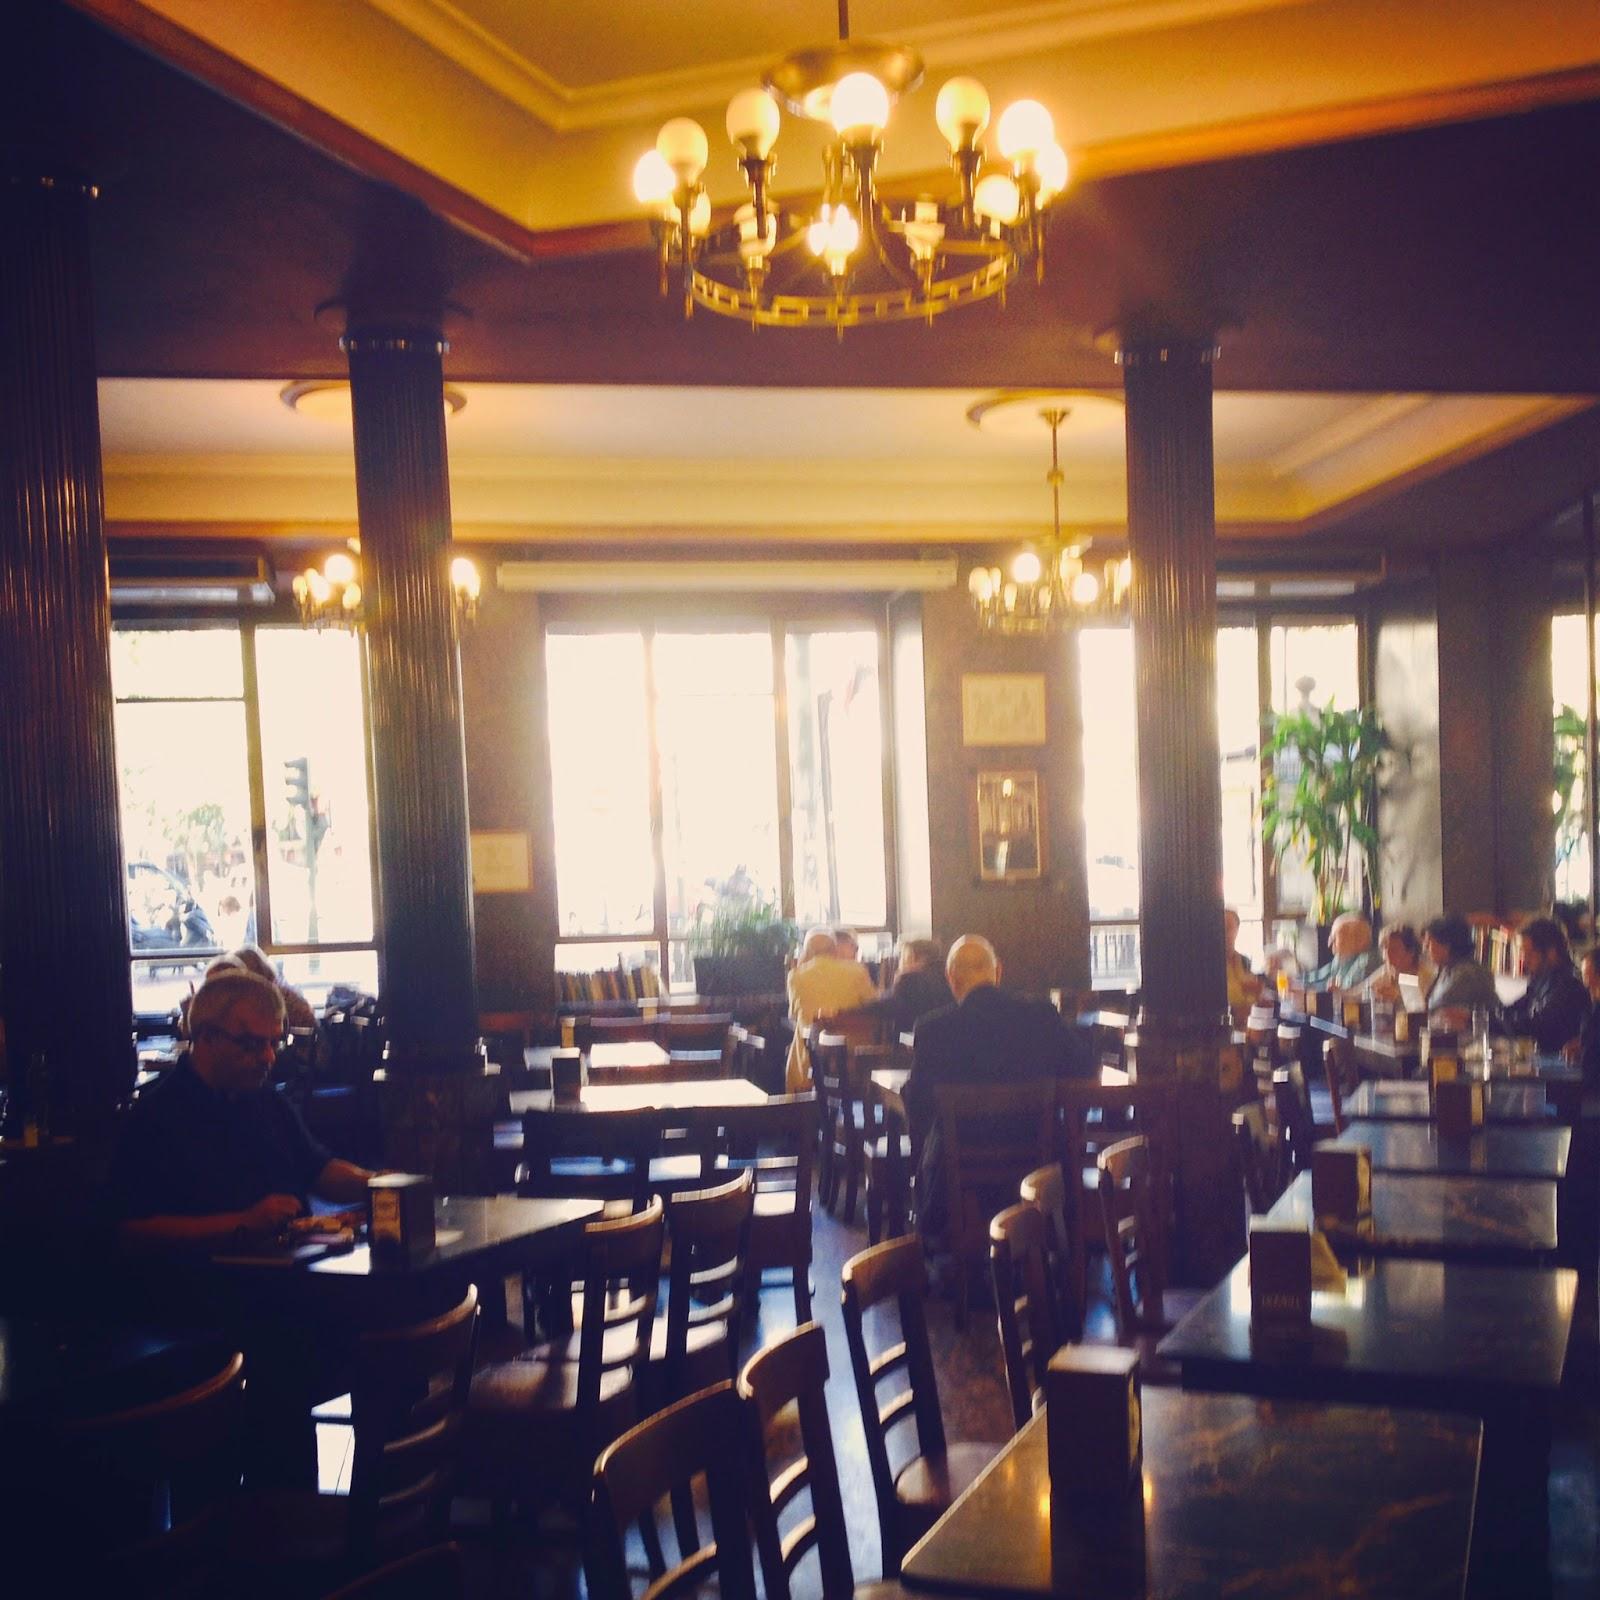 cafe comercial interior 2